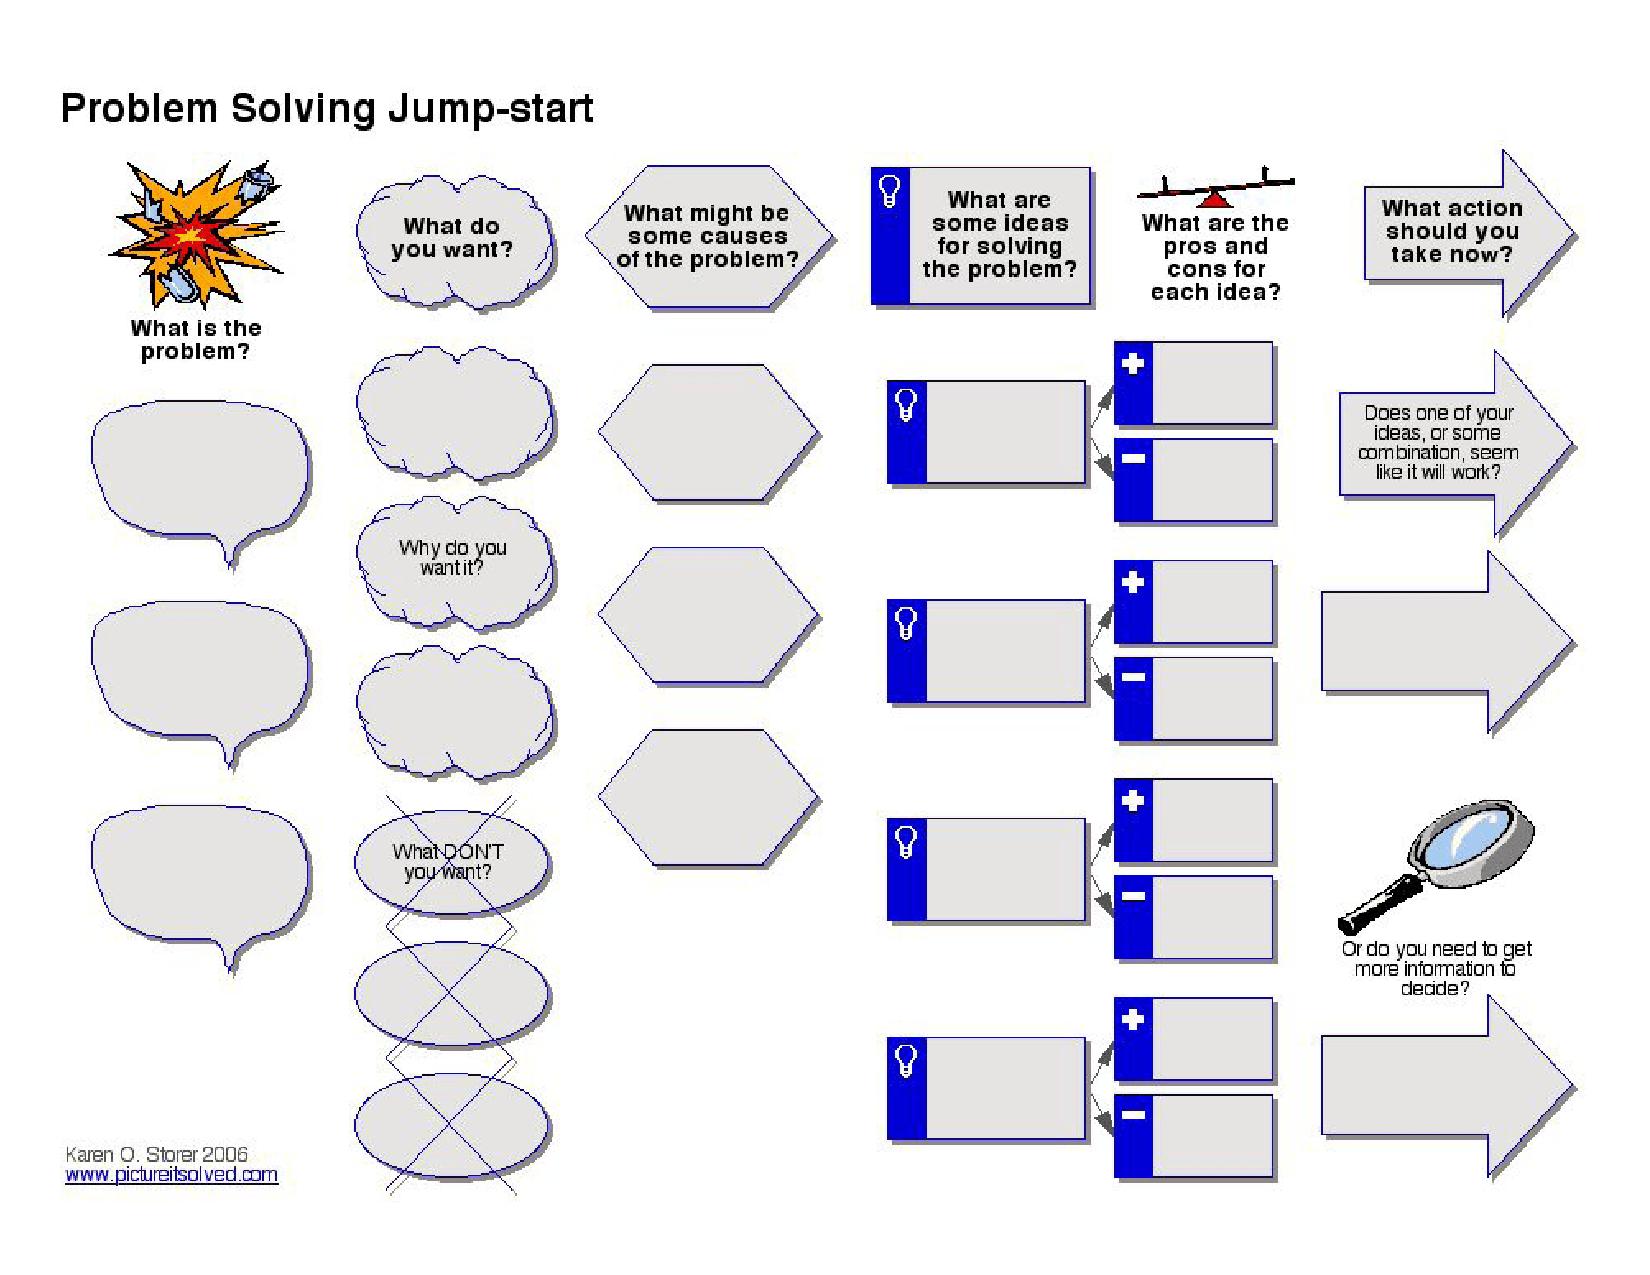 Problem Solving Basics